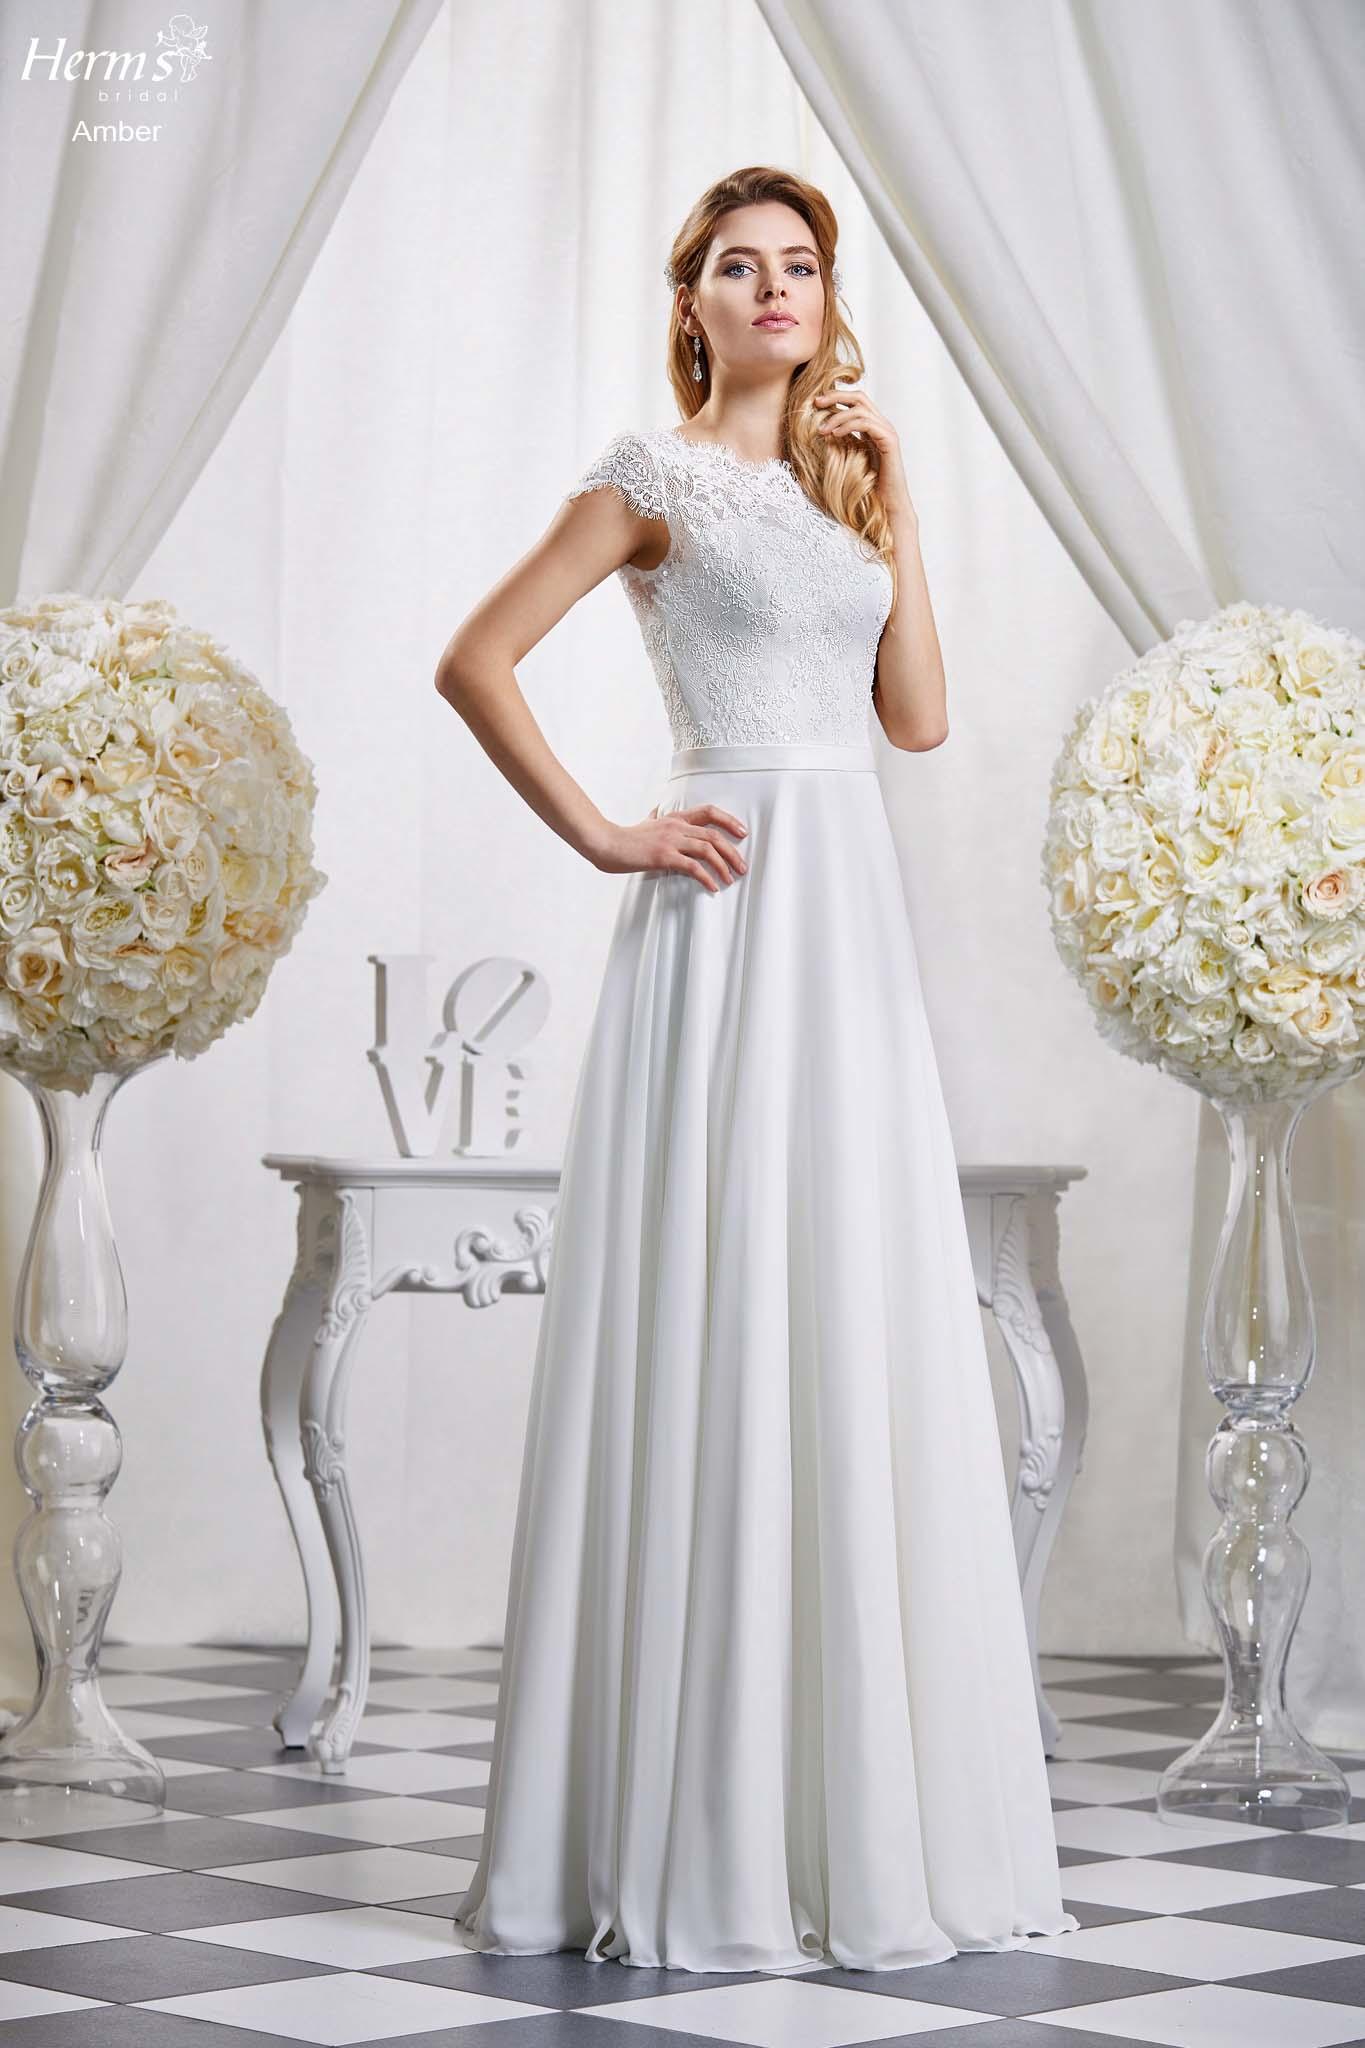 suknia ślubna Herm's Bridal Amber